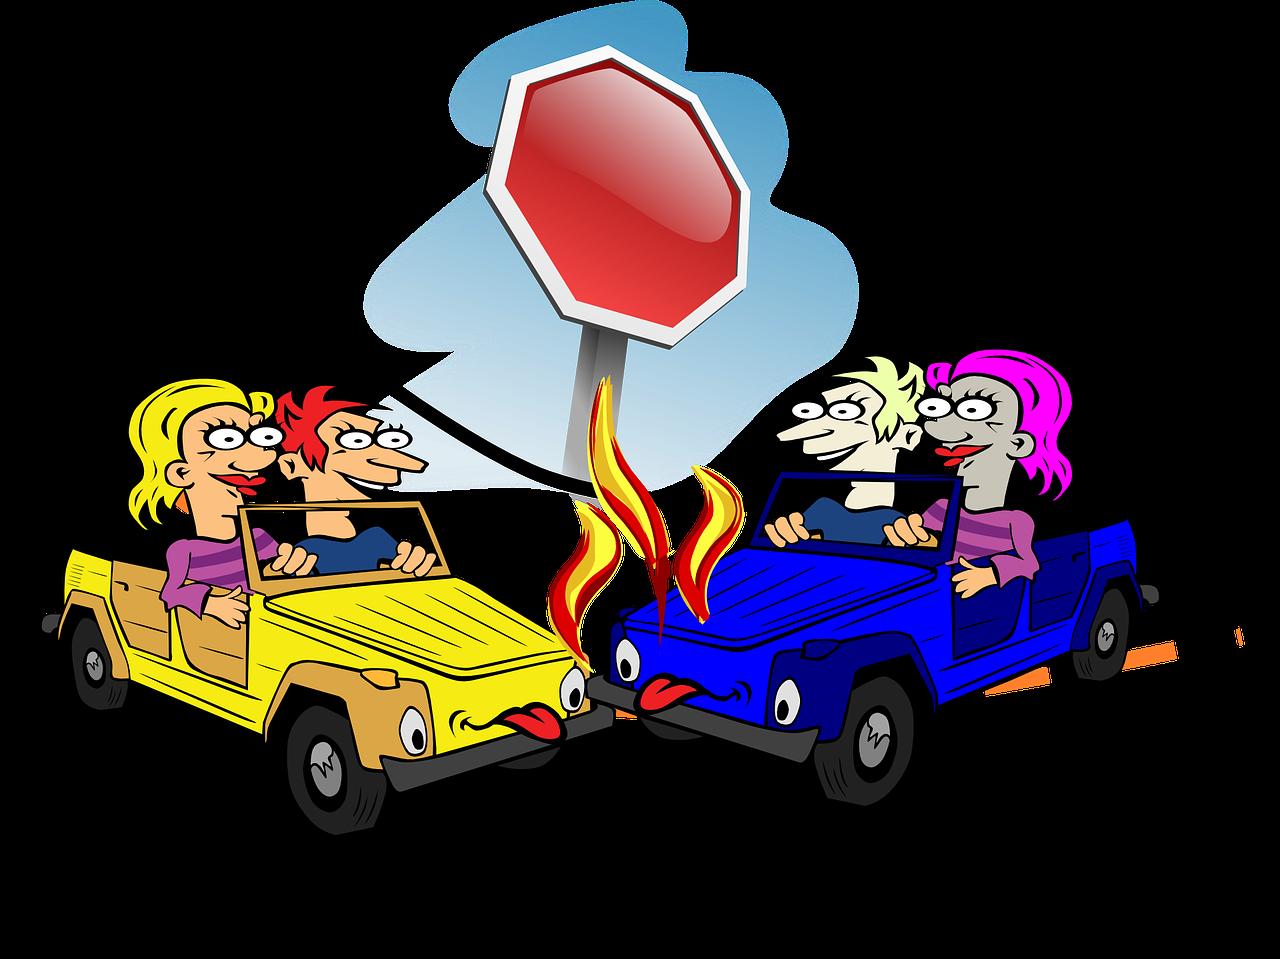 Clipart car on road svg download Crash Car Accident Stop Sign Car PNG Image - Picpng svg download